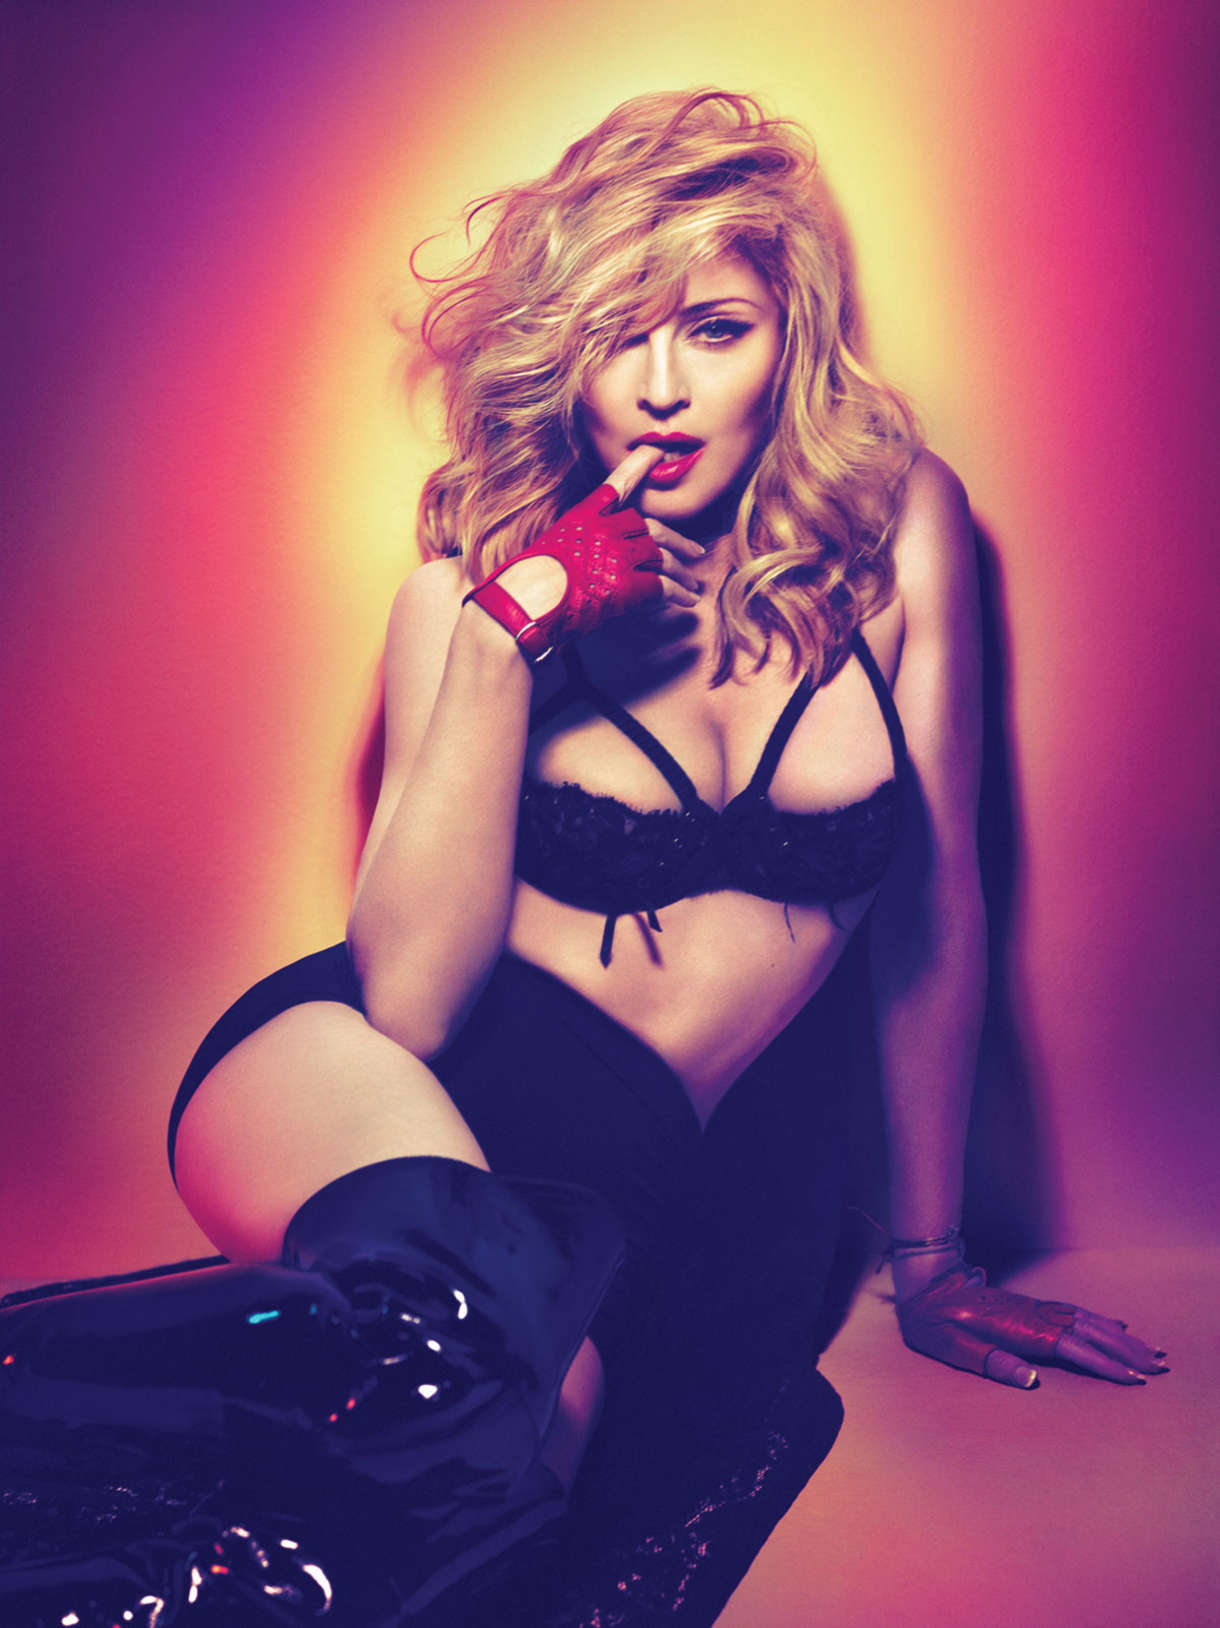 Watch Madonna sexy photos video